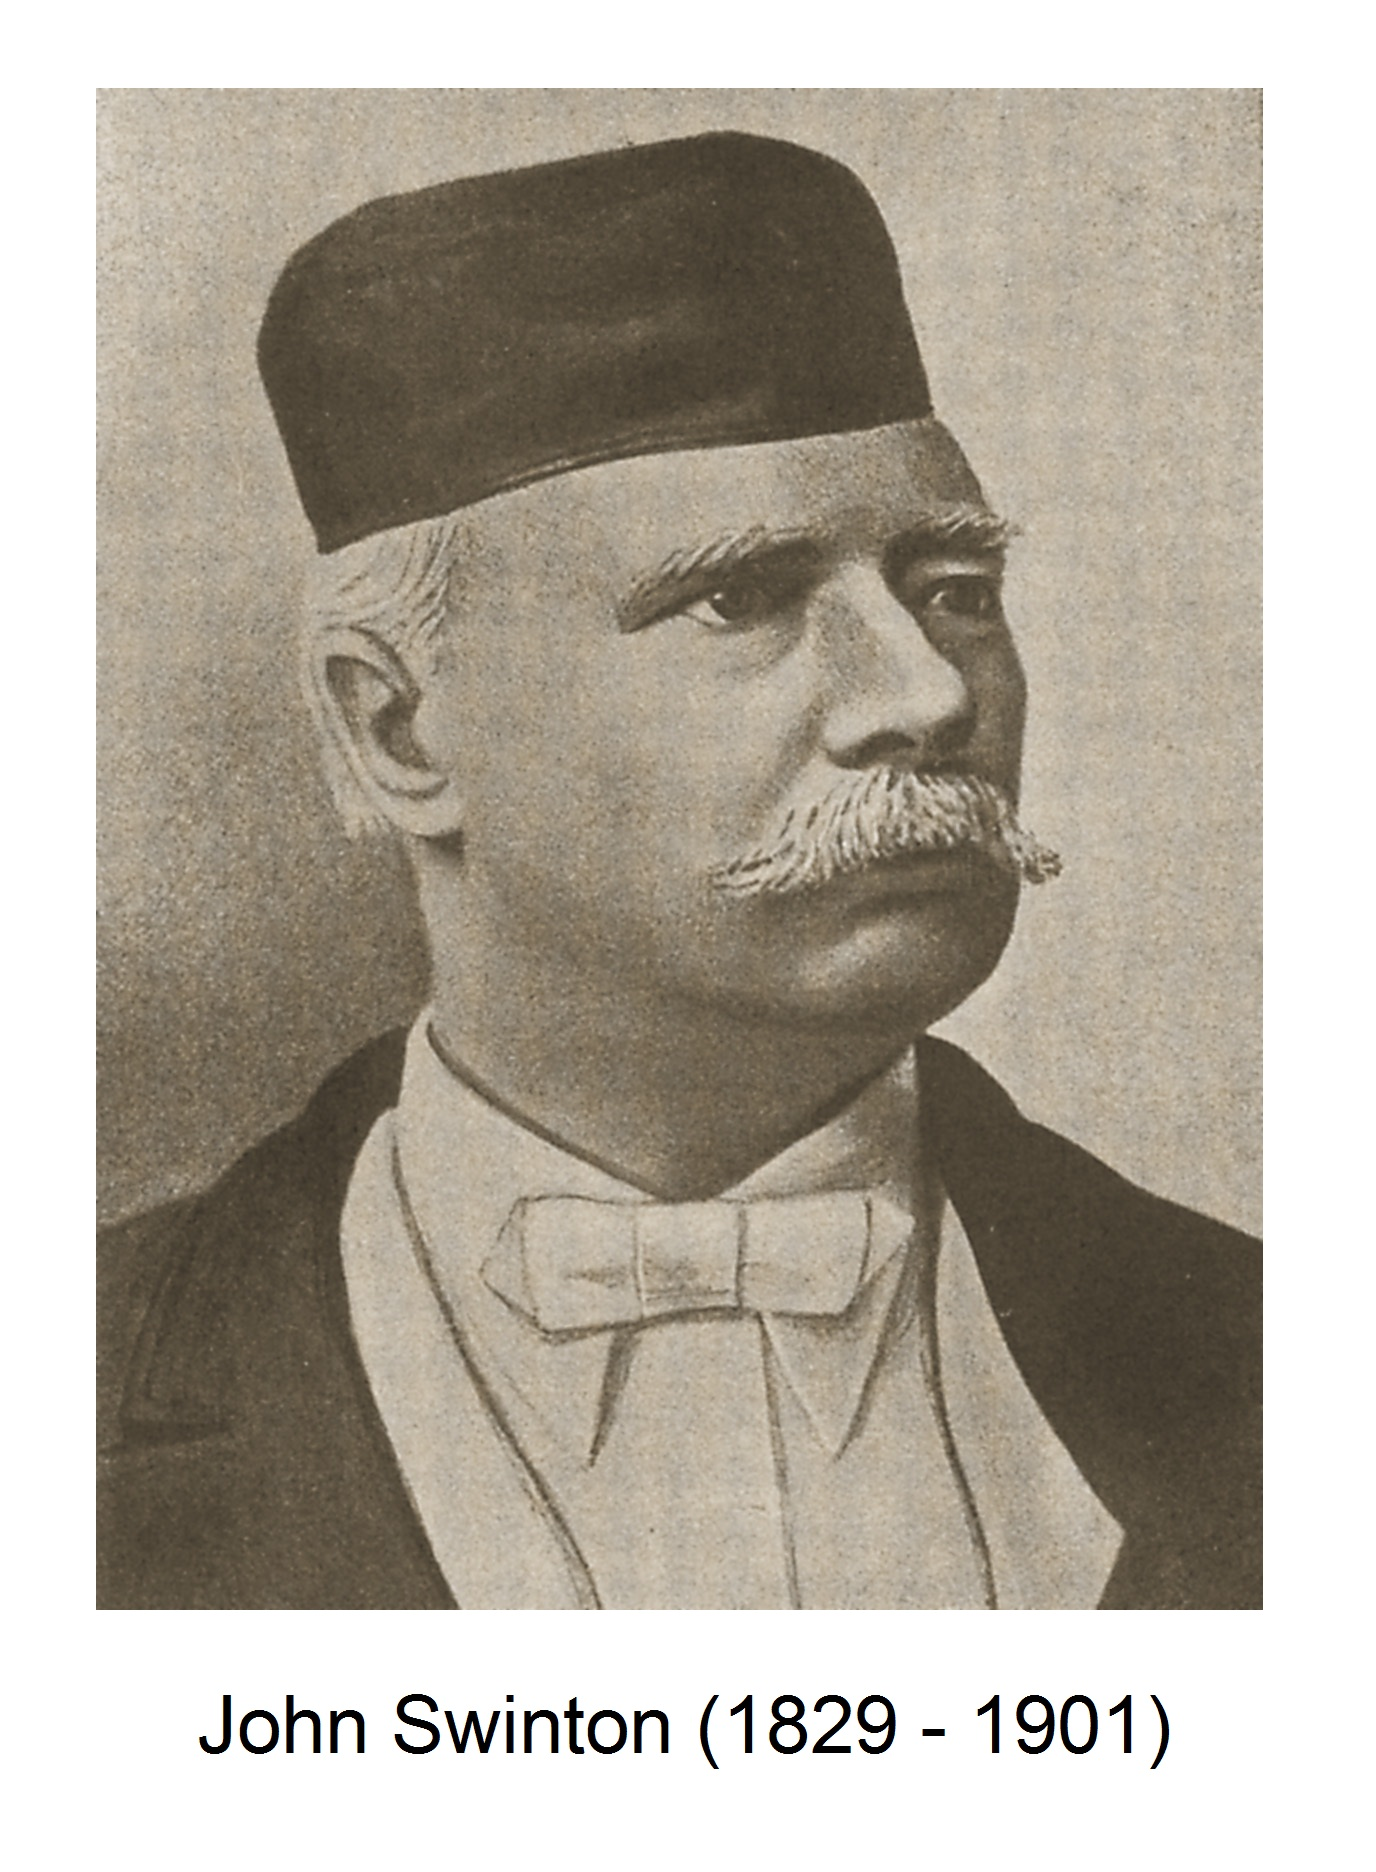 John Swinton